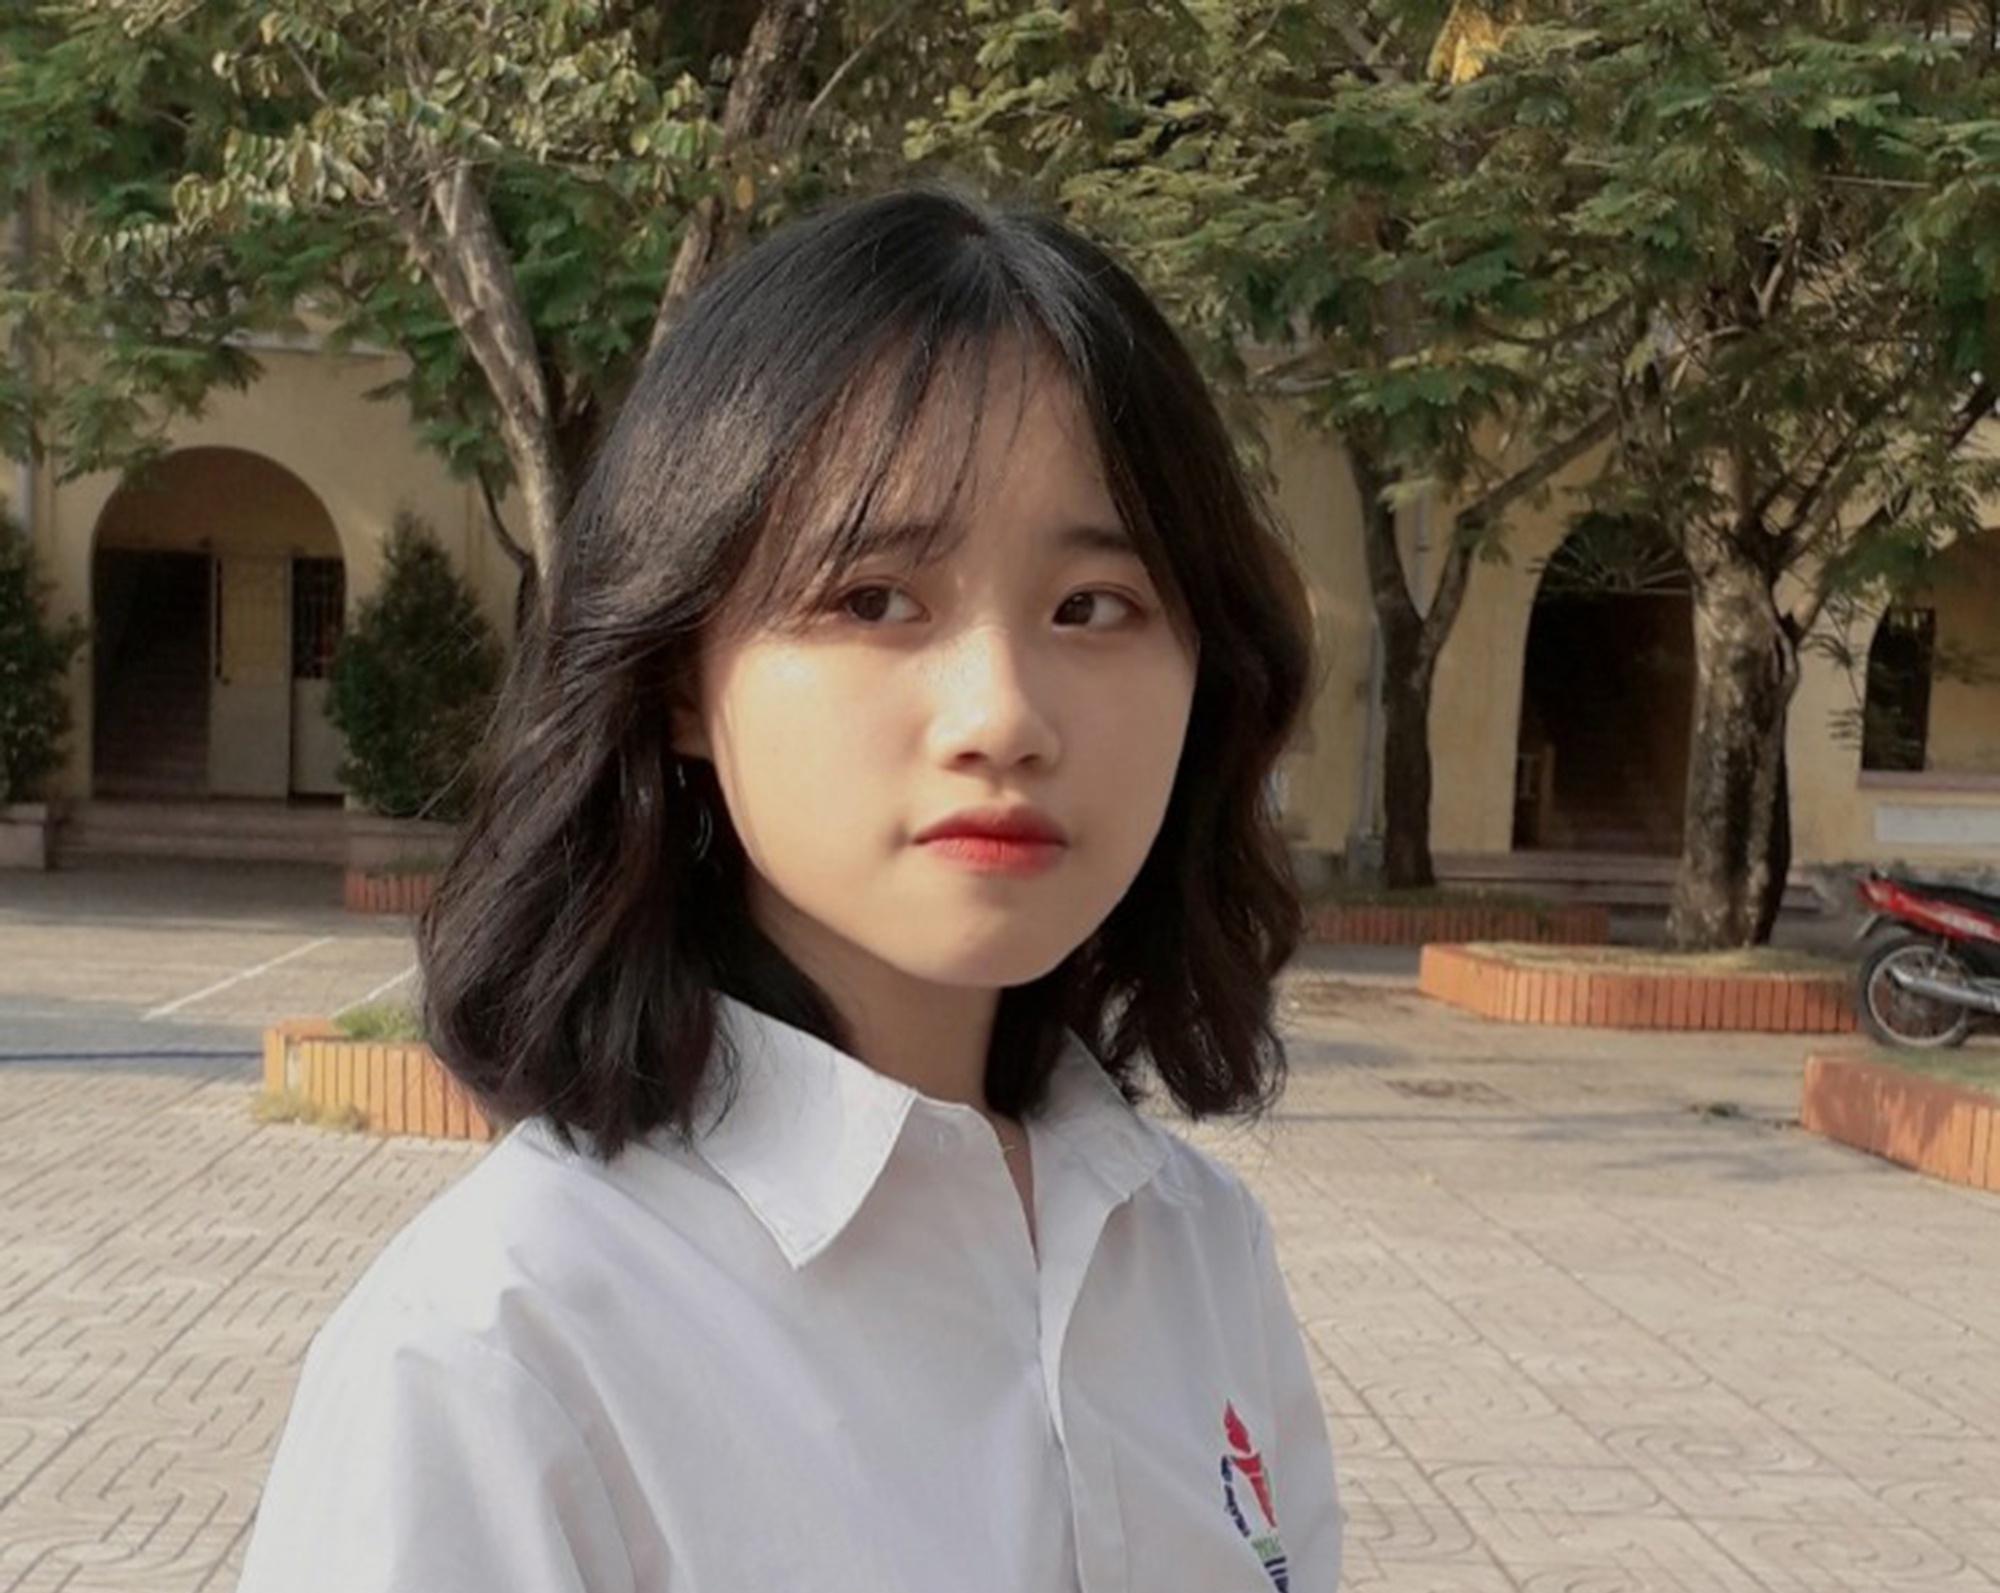 Thu khoa khoi C cua Hai Phong anh 3